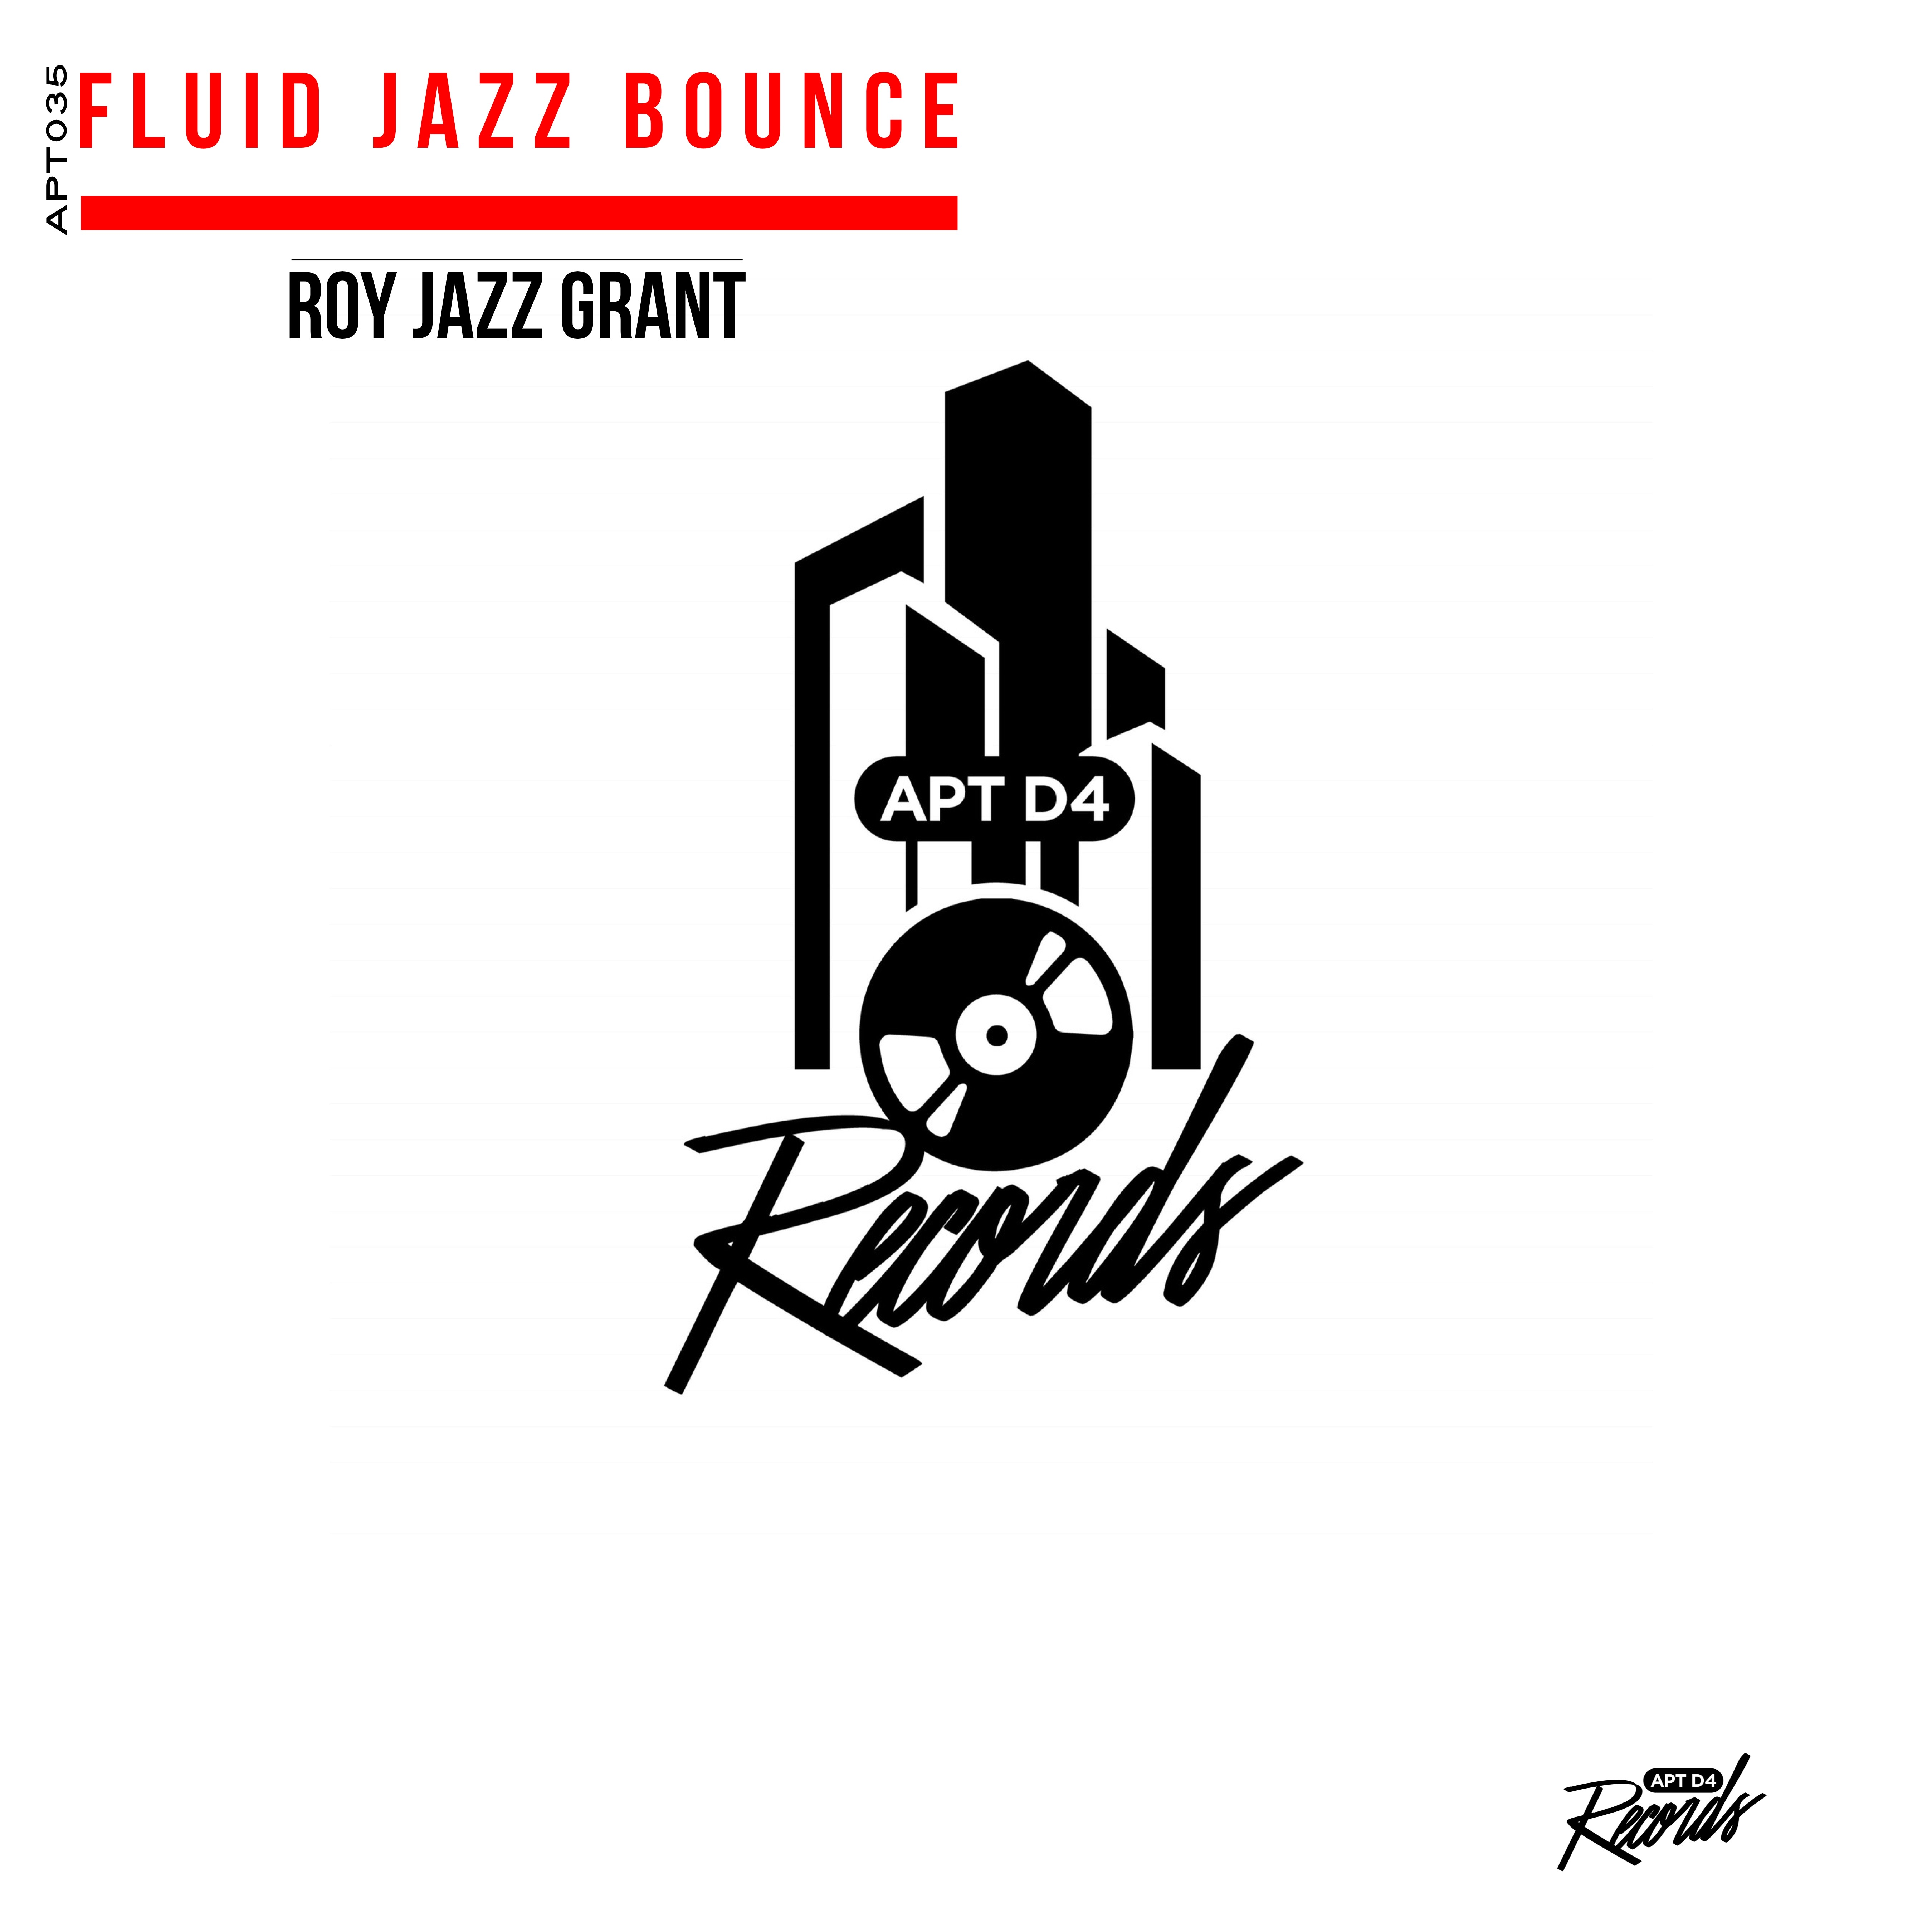 Fluid Jazz Bounce